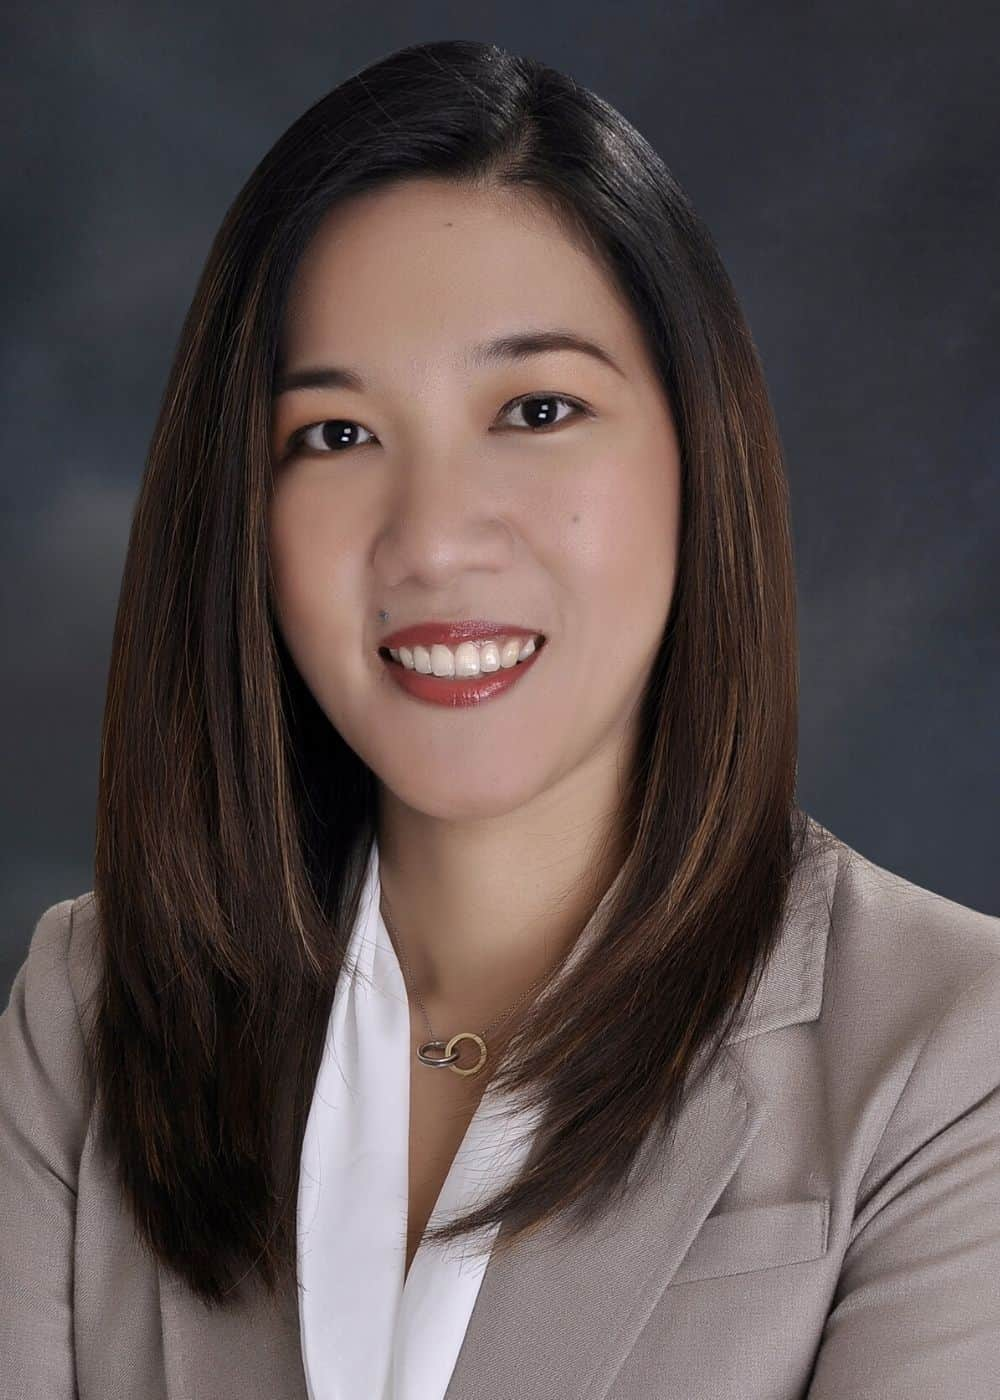 Lesley Jeanne Cordero